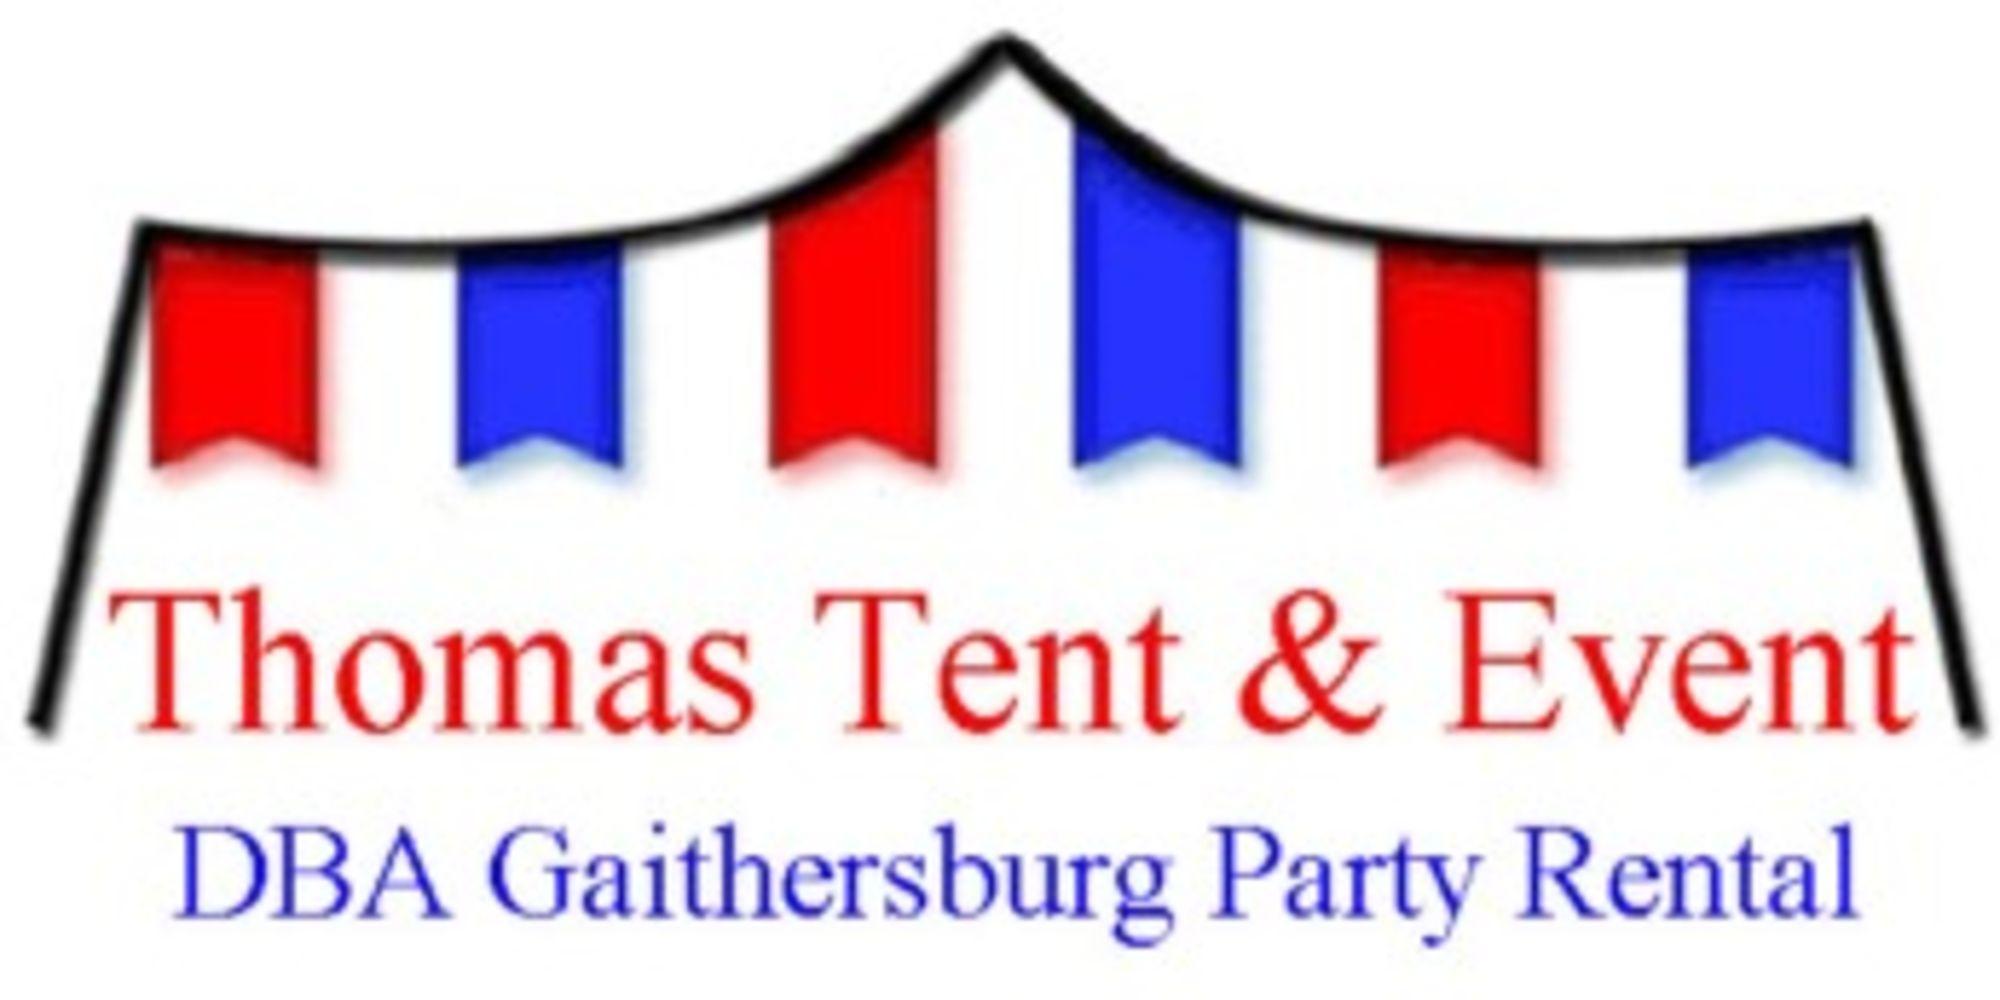 Thomas Tent & Event dba Gaithersburg Party Rental